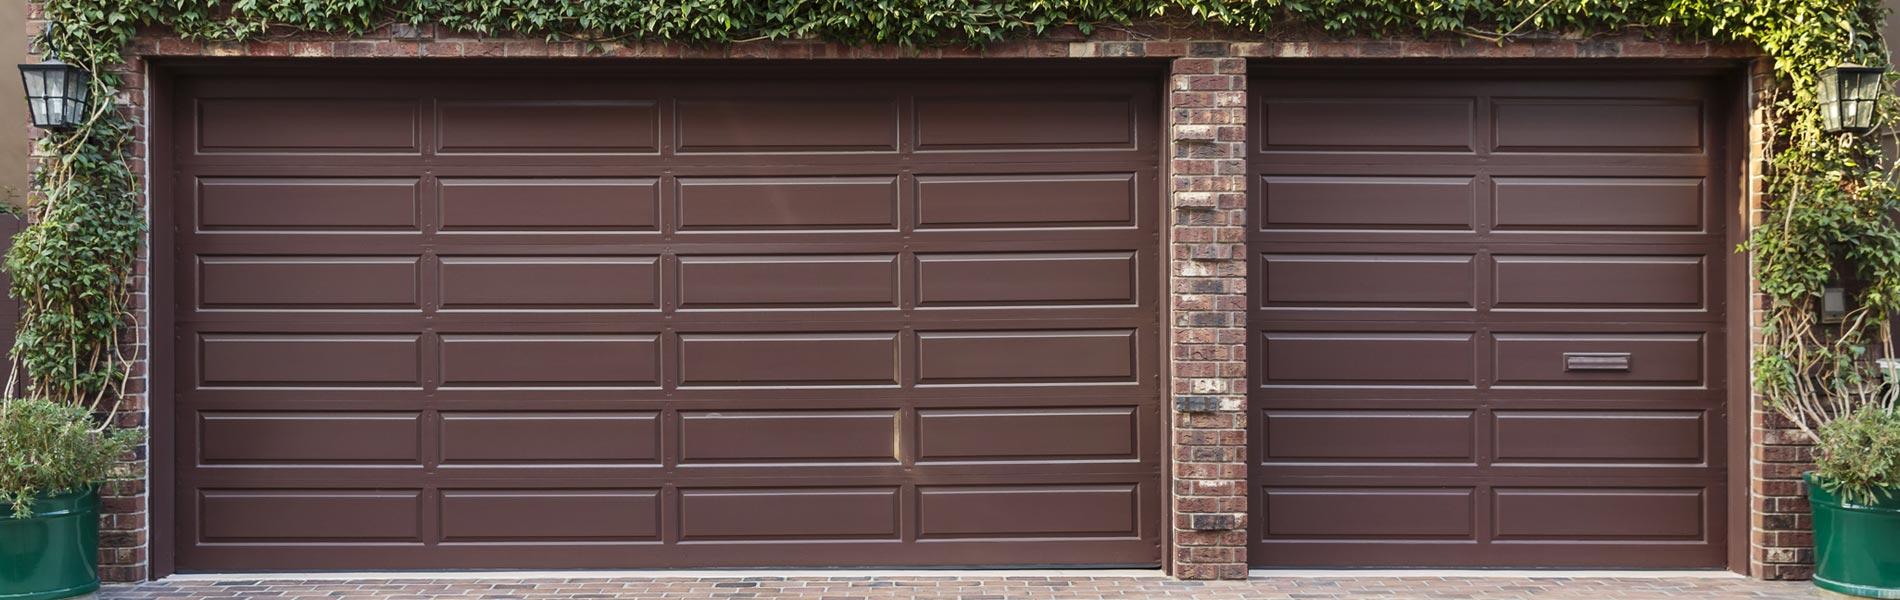 steel garage moka cost full antonio and aall san size doors style of door brown modern openers